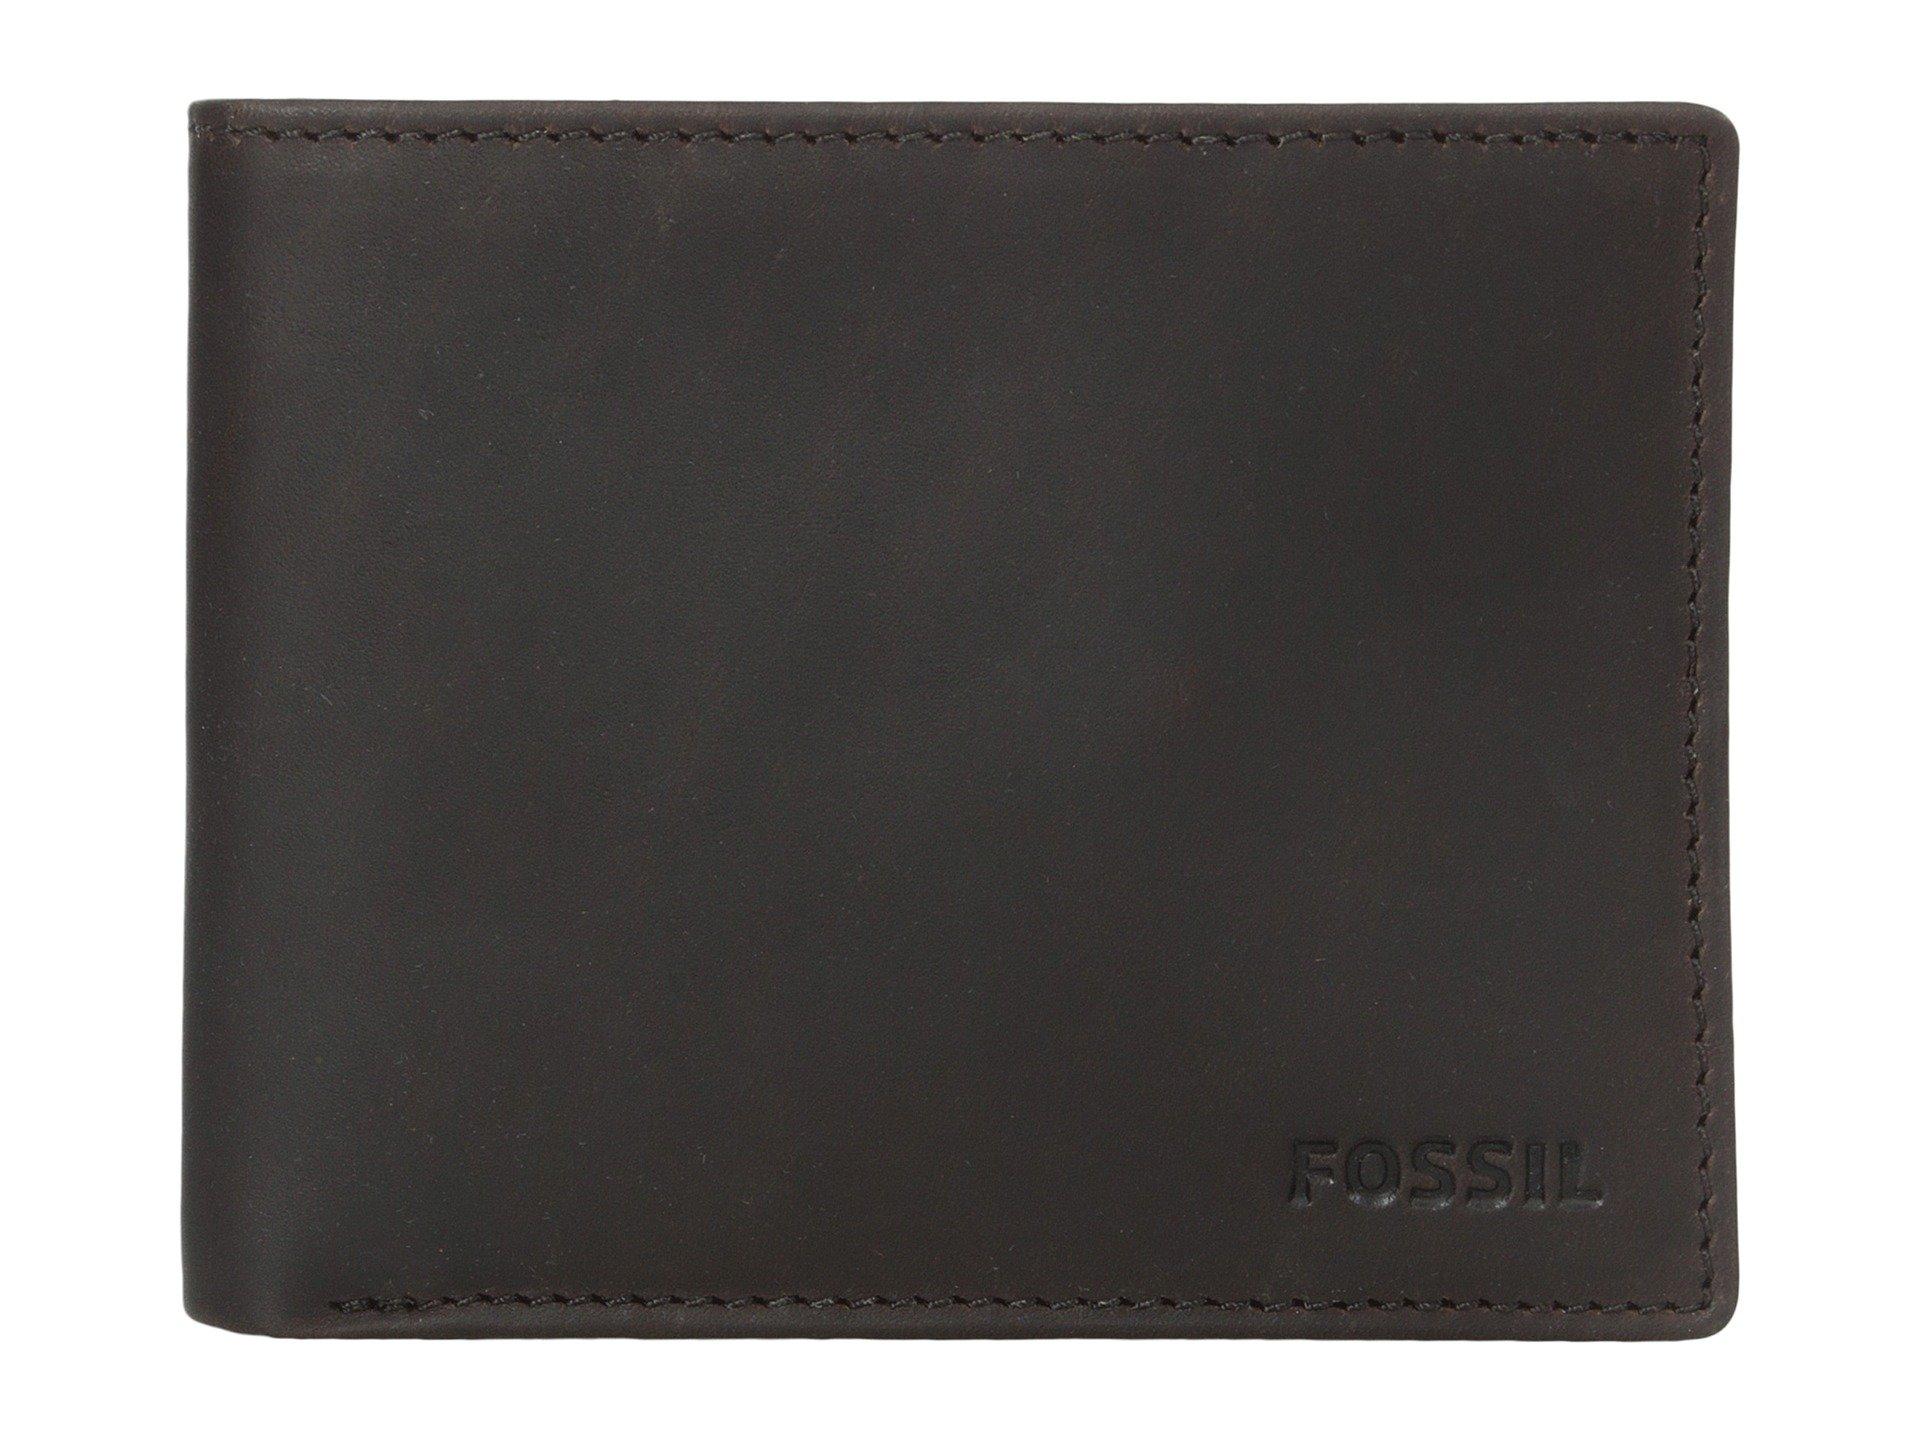 Billetera para Hombre Fossil Adam Passcase  + Fossil en VeoyCompro.net